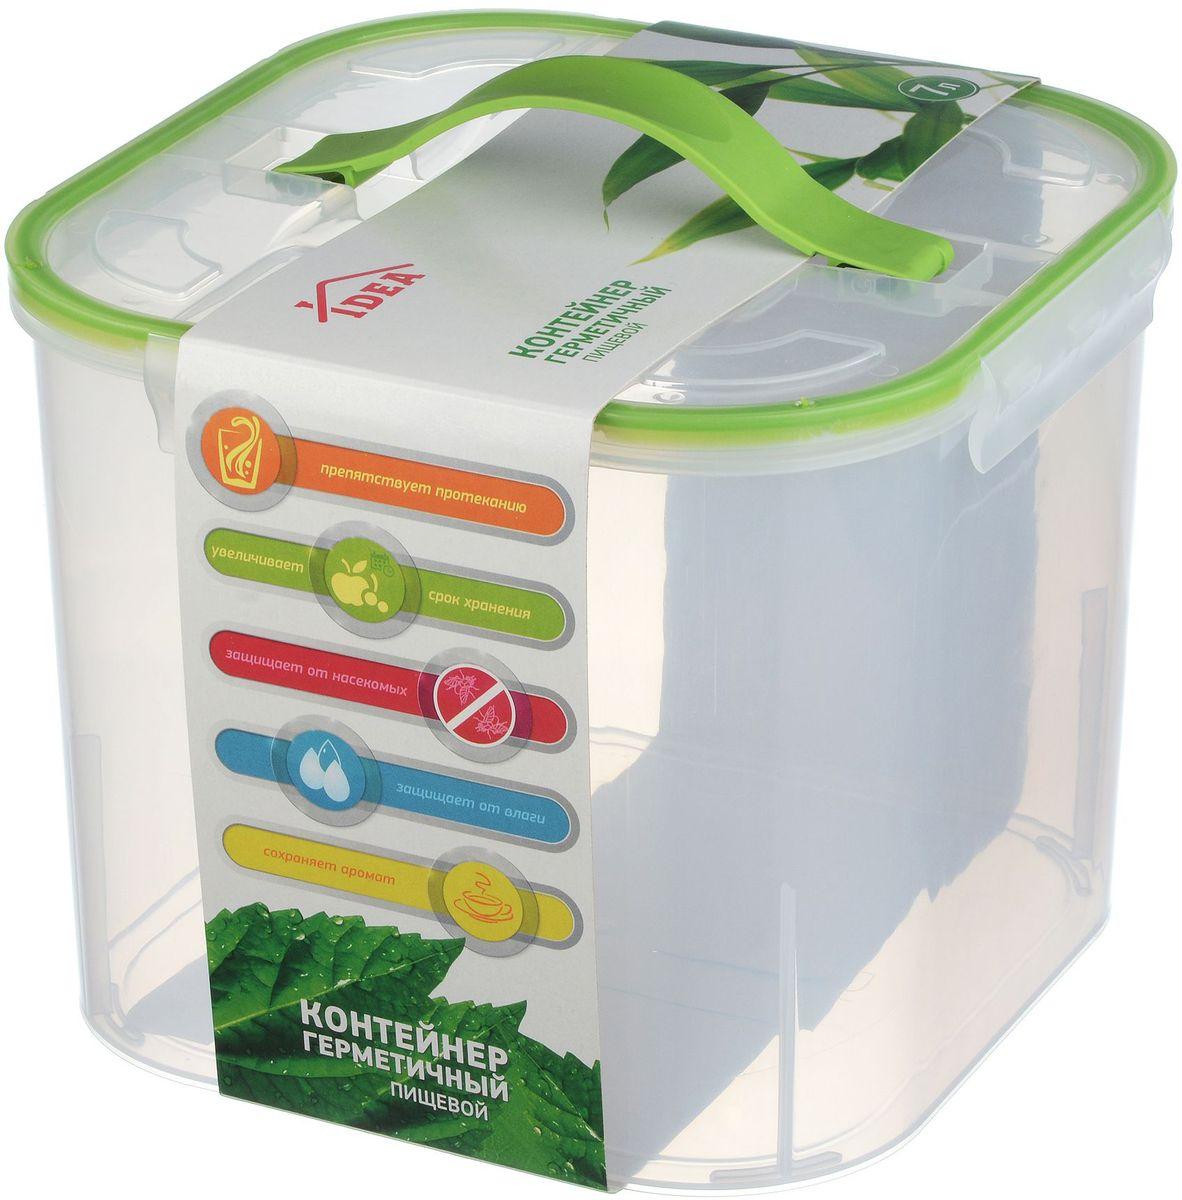 Контейнер для хранения Idea, цвет: прозрачный, 23 х 23 х 18 см контейнер для хранения idea фрукты 7 л